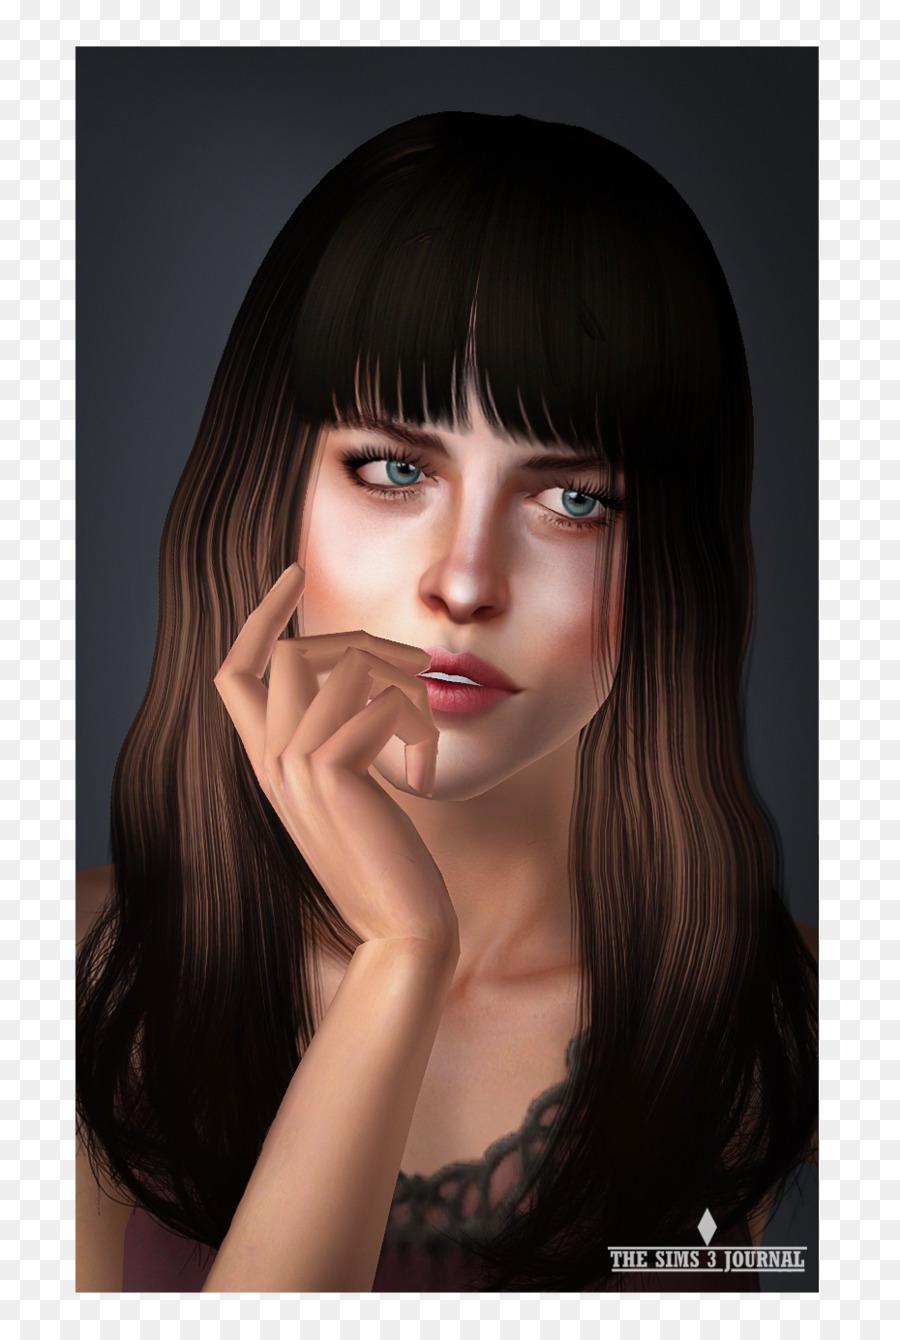 Die Sims 3 Dakota Johnson Die Sims 4 Die Sims 2 Anastasia Steele